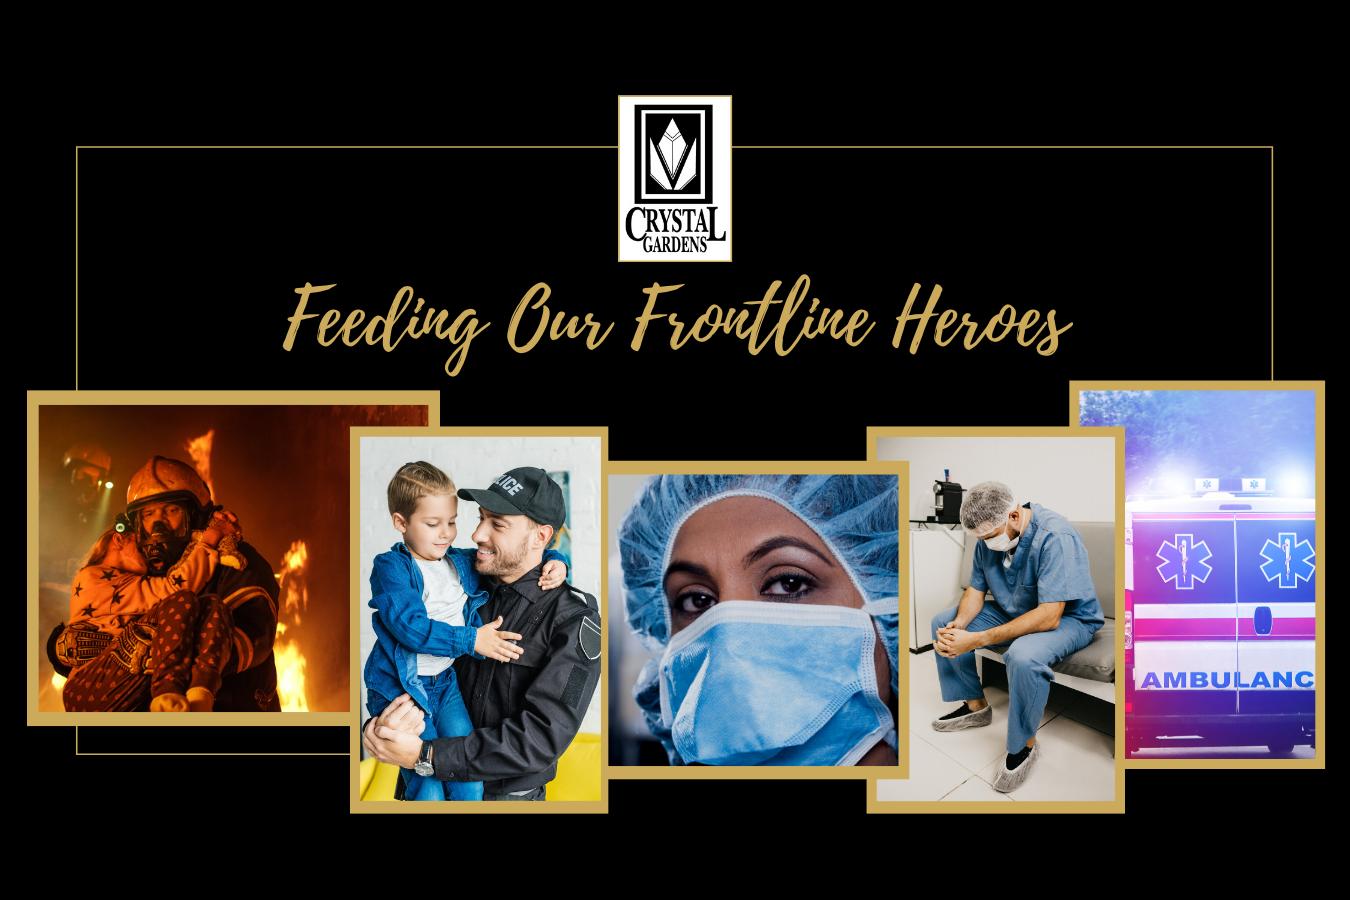 Feeding Our Frontline Heroes